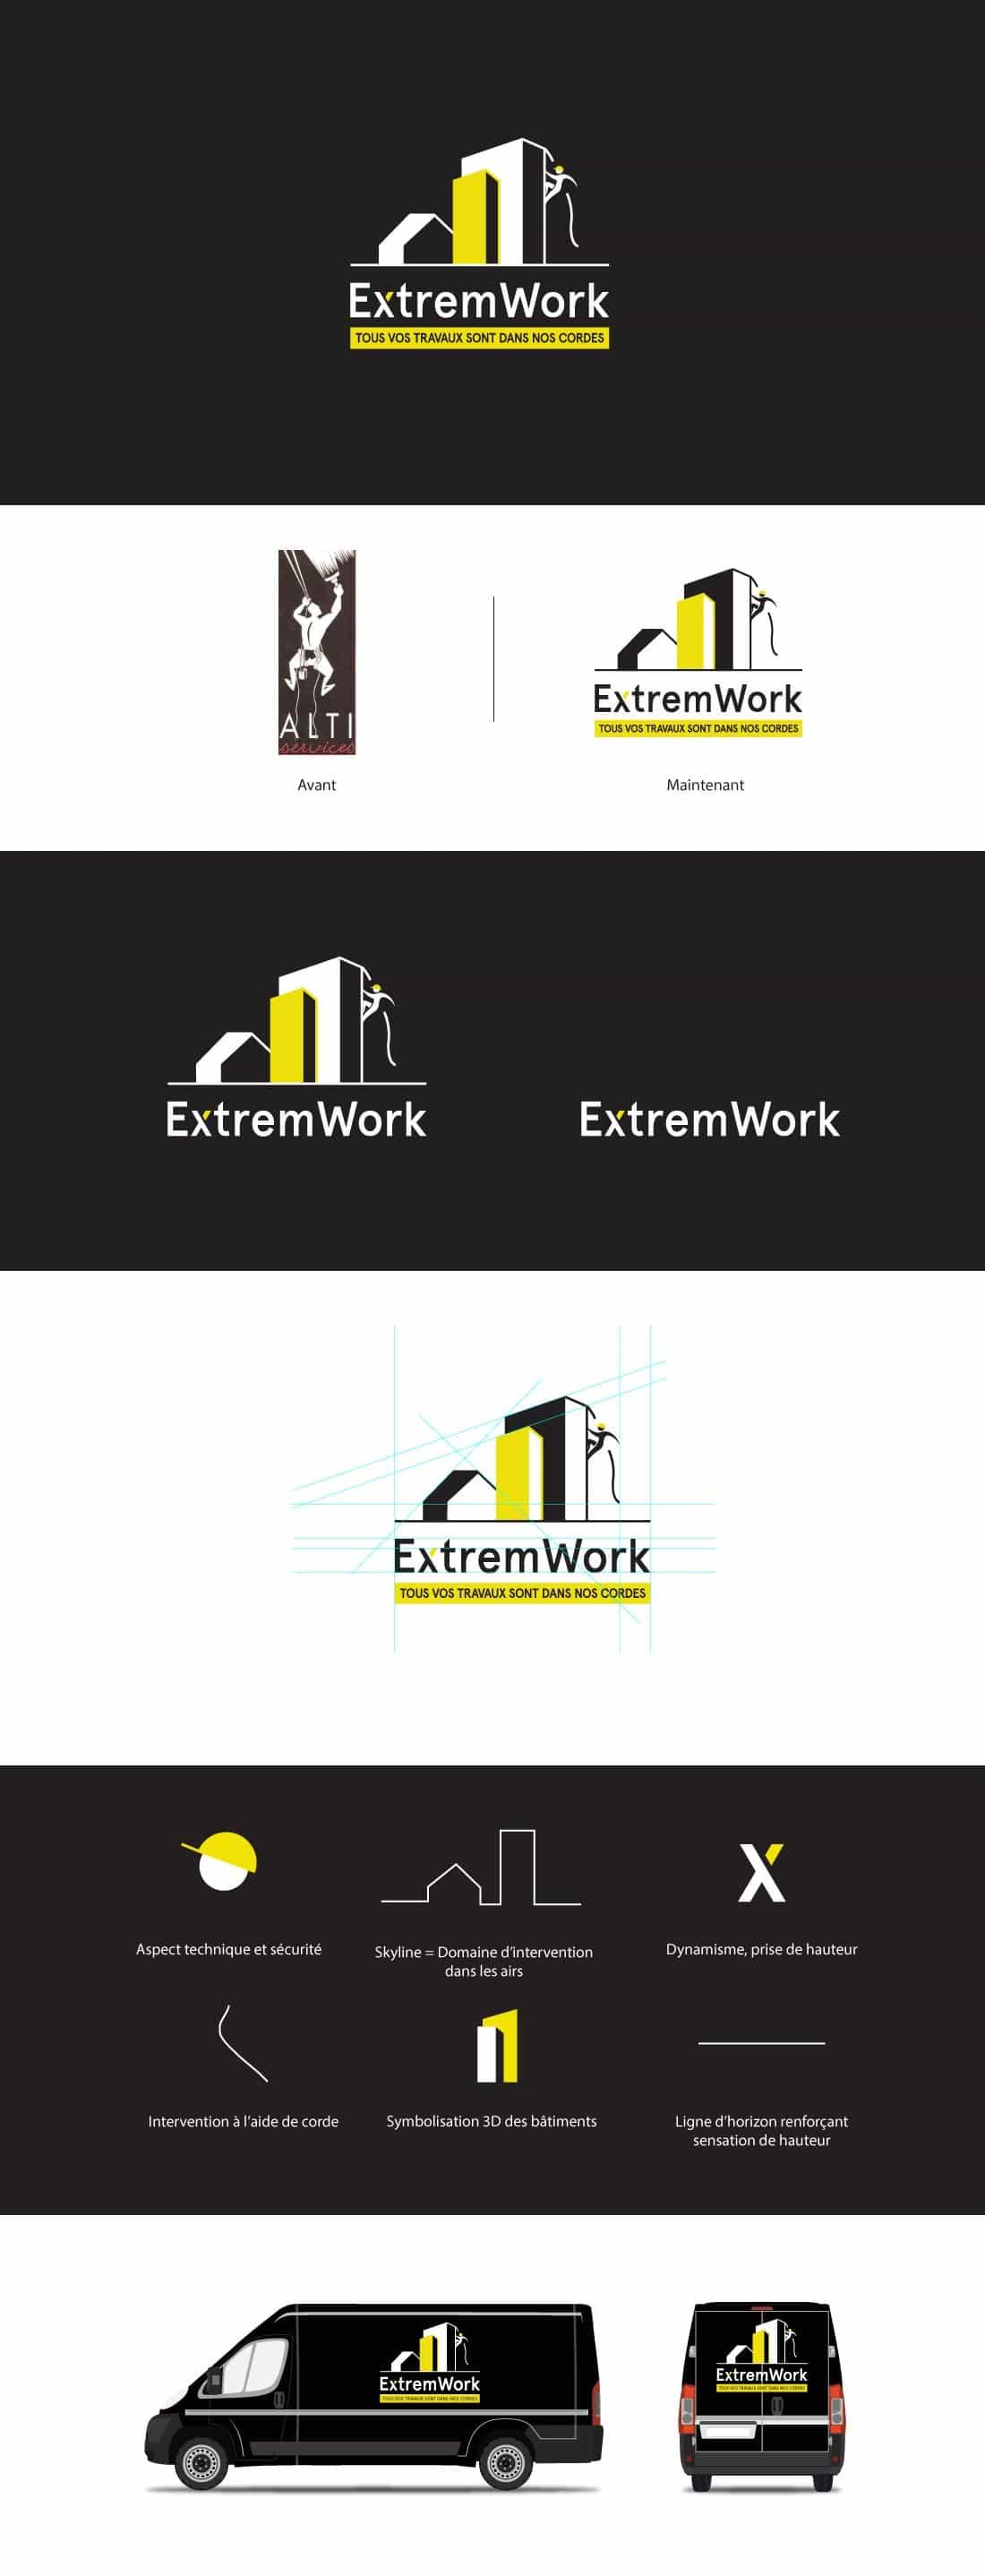 extremwork logo et identité visuelle